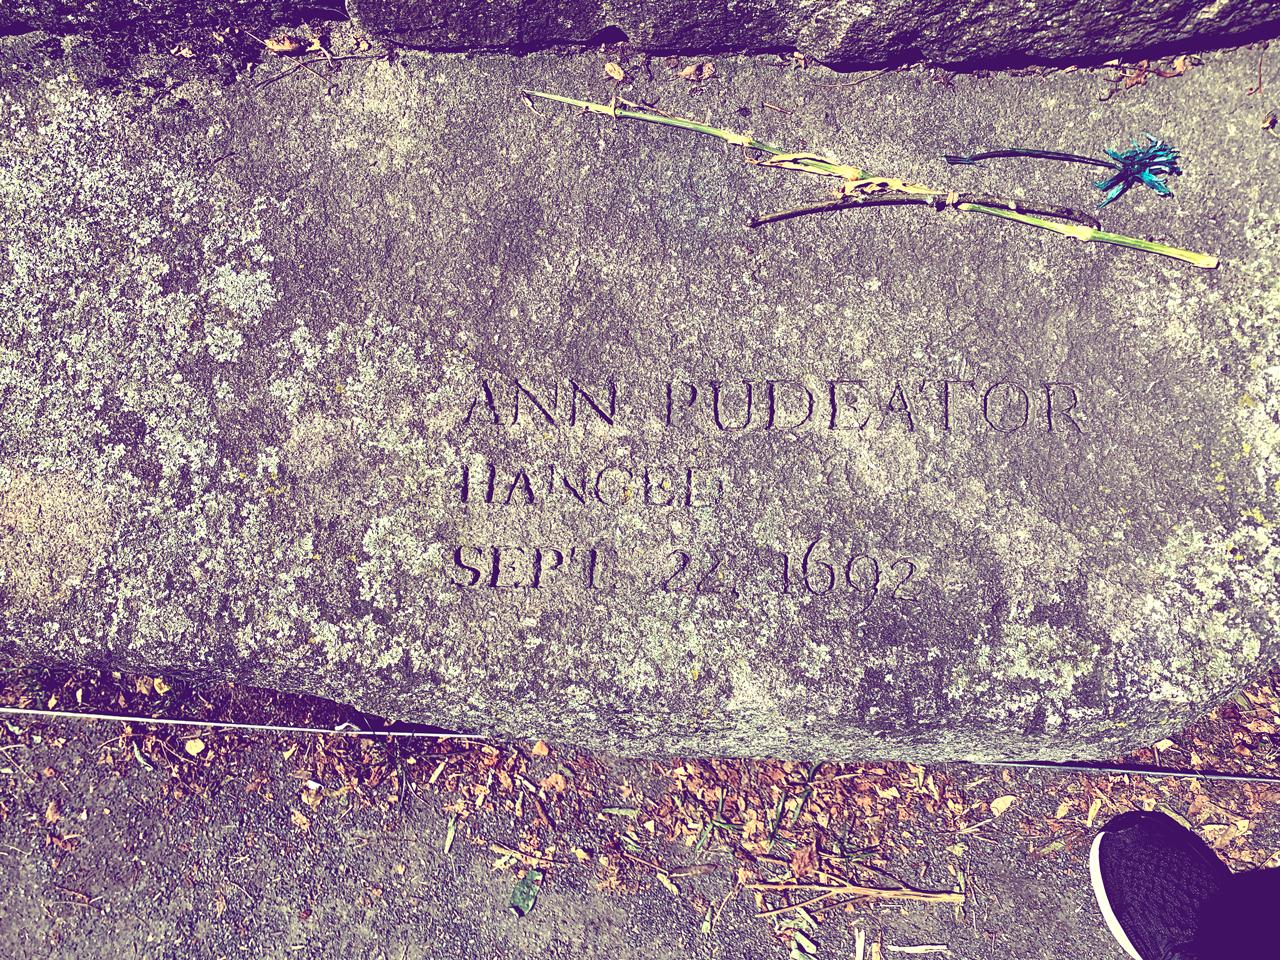 salem-witch-trials-memorial-massachusetts-ann-pudeator-1280x960